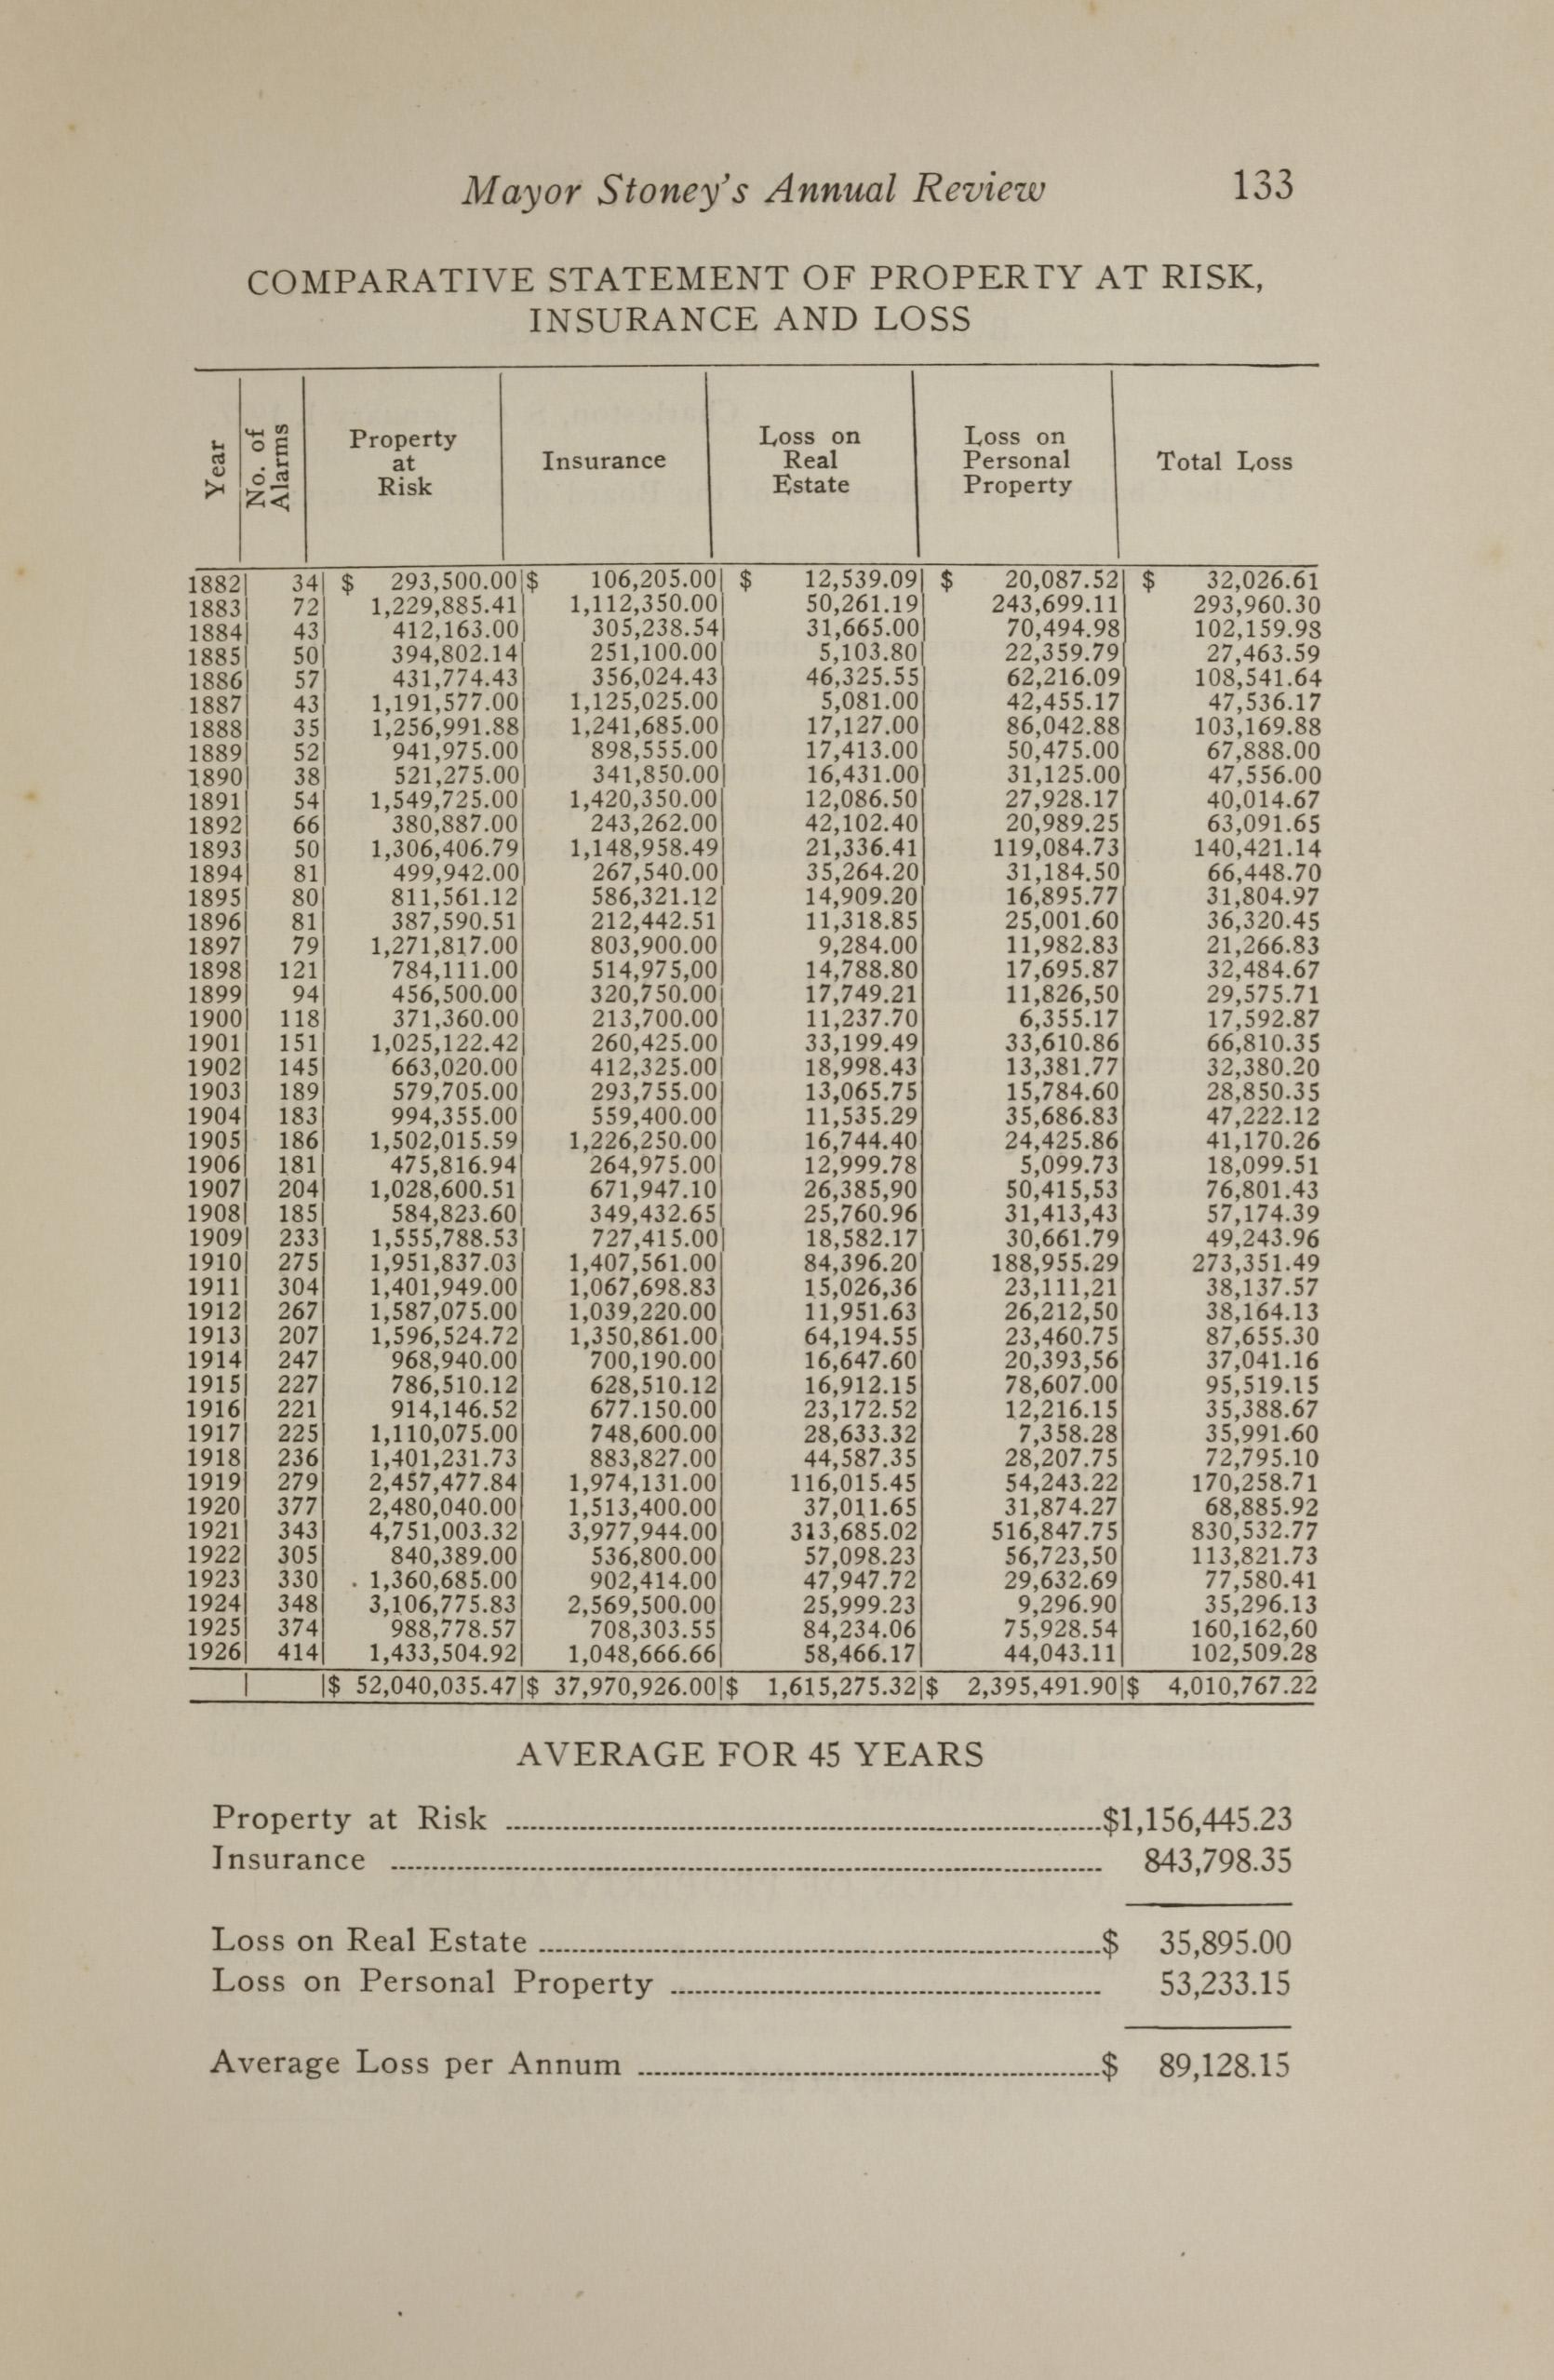 Charleston Yearbook, 1926, page 133